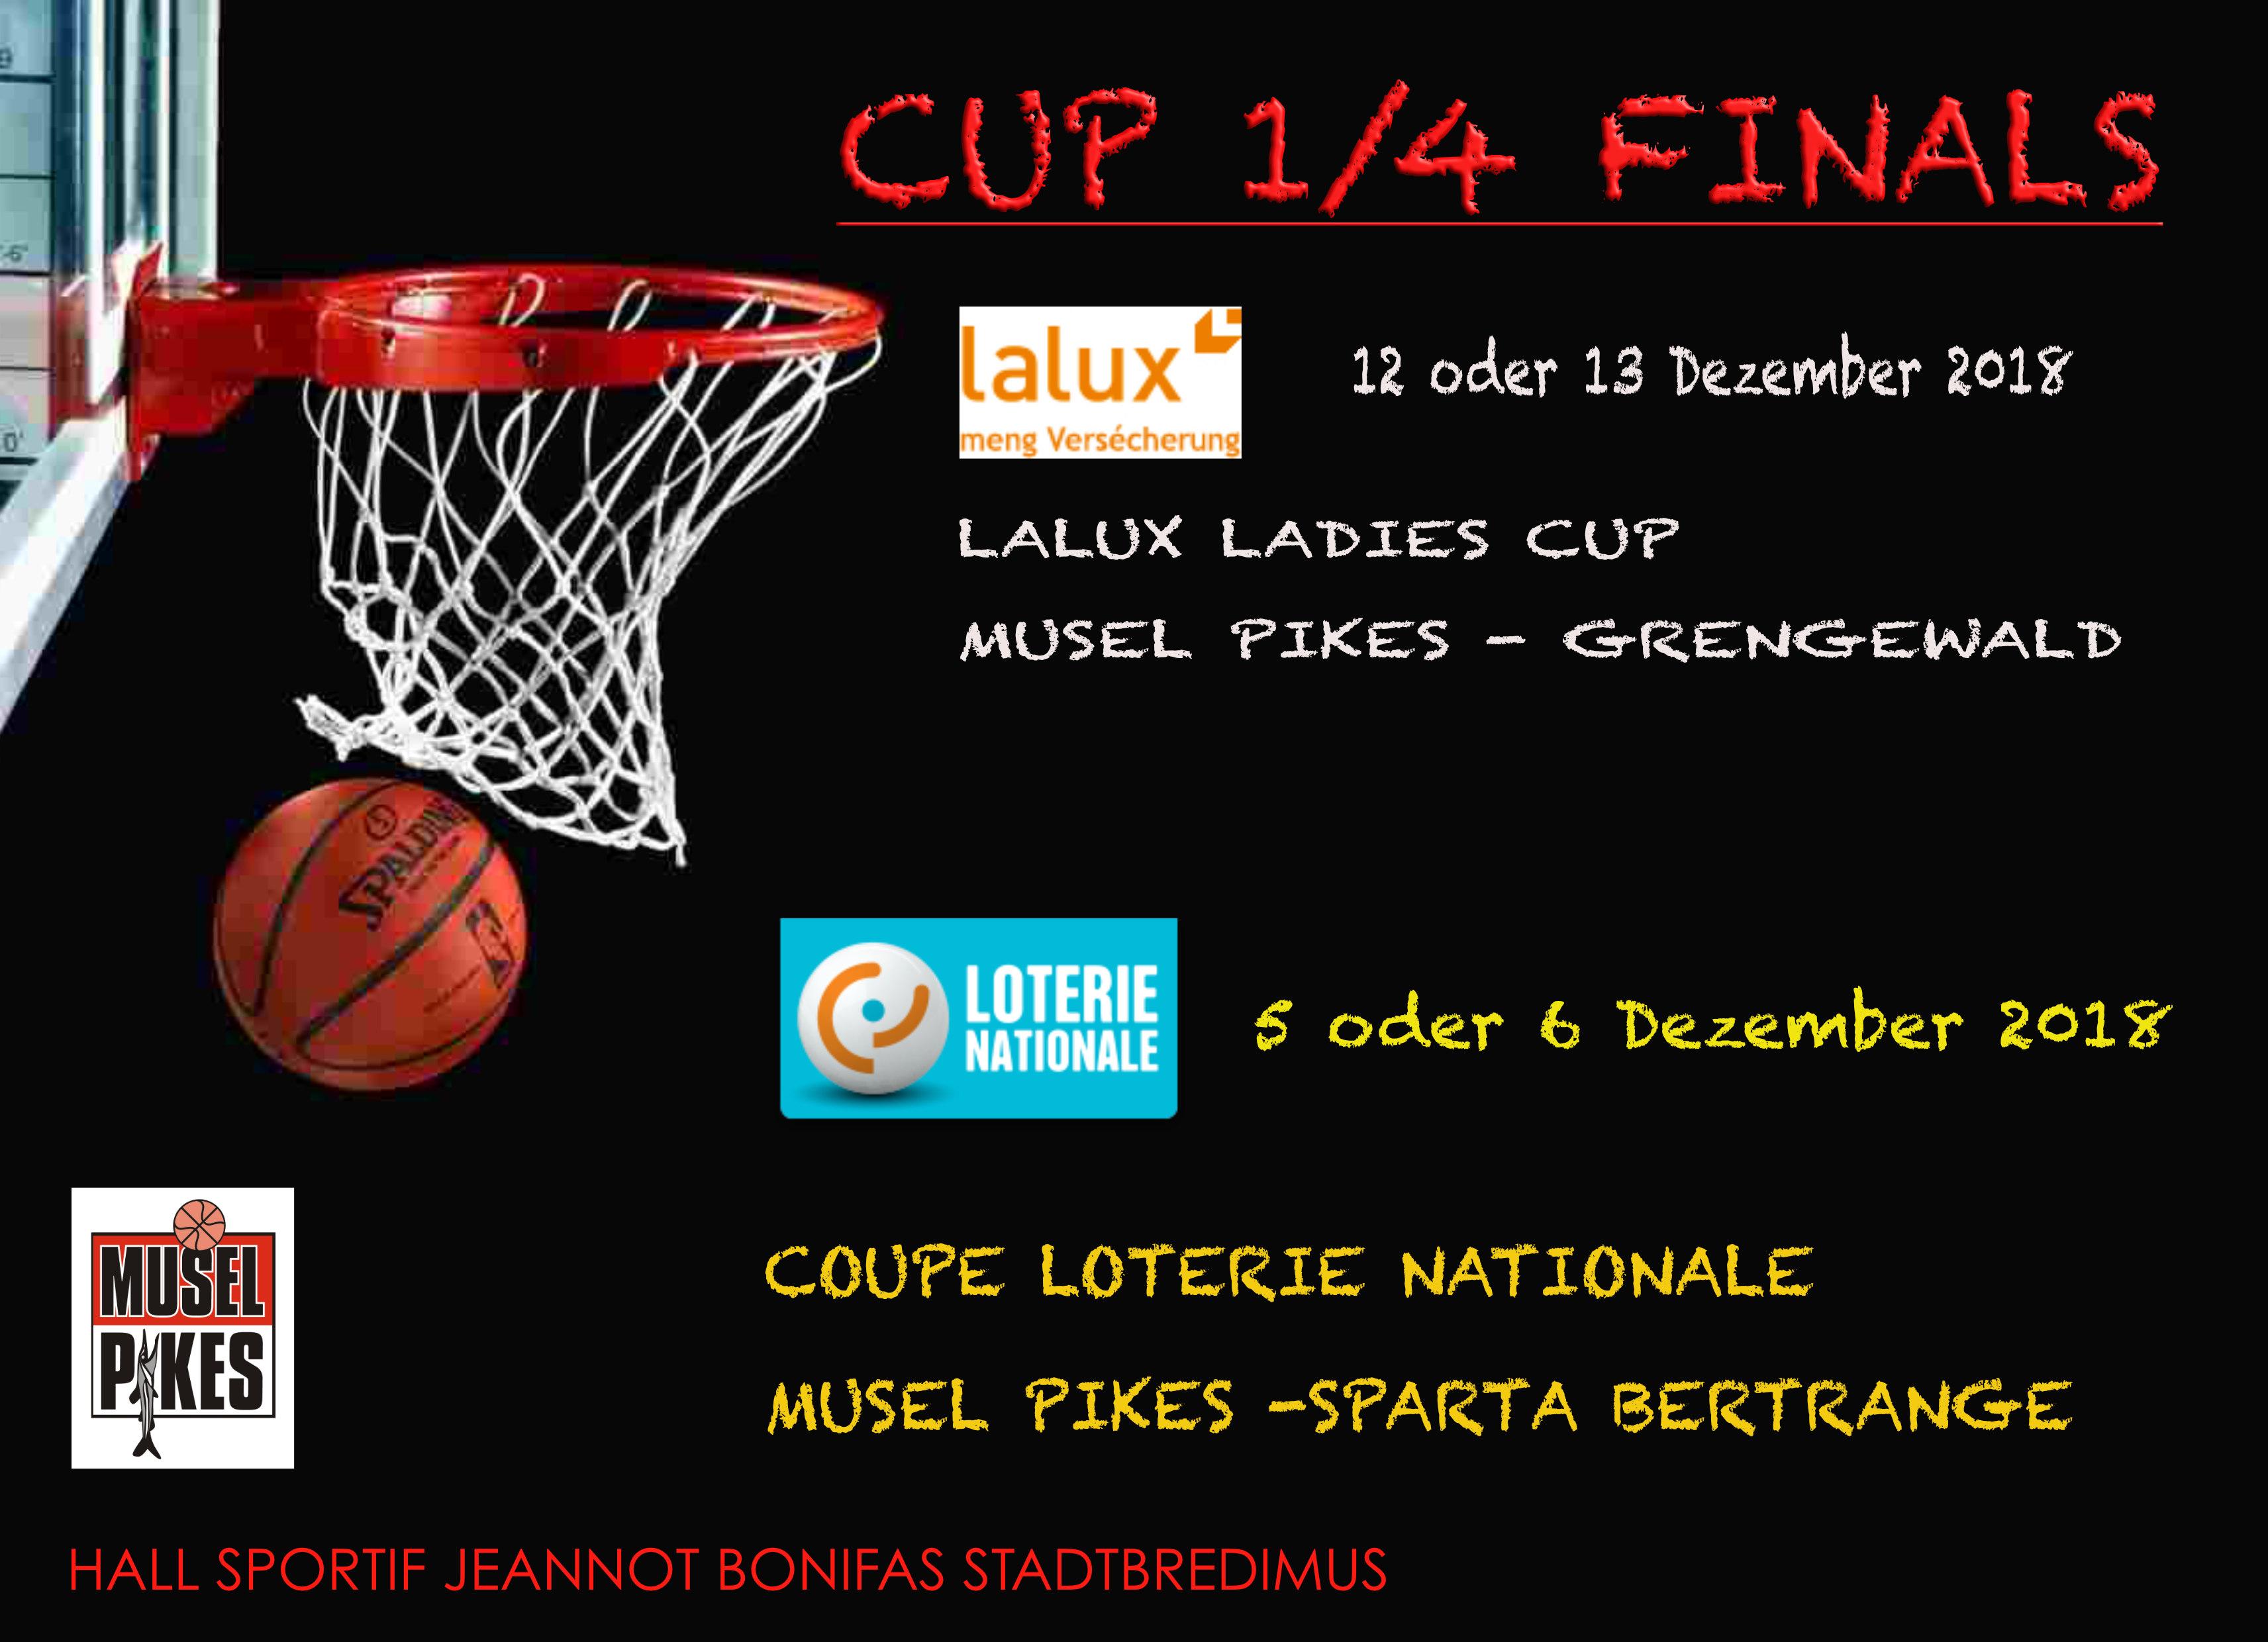 CUP 1/4 Finals